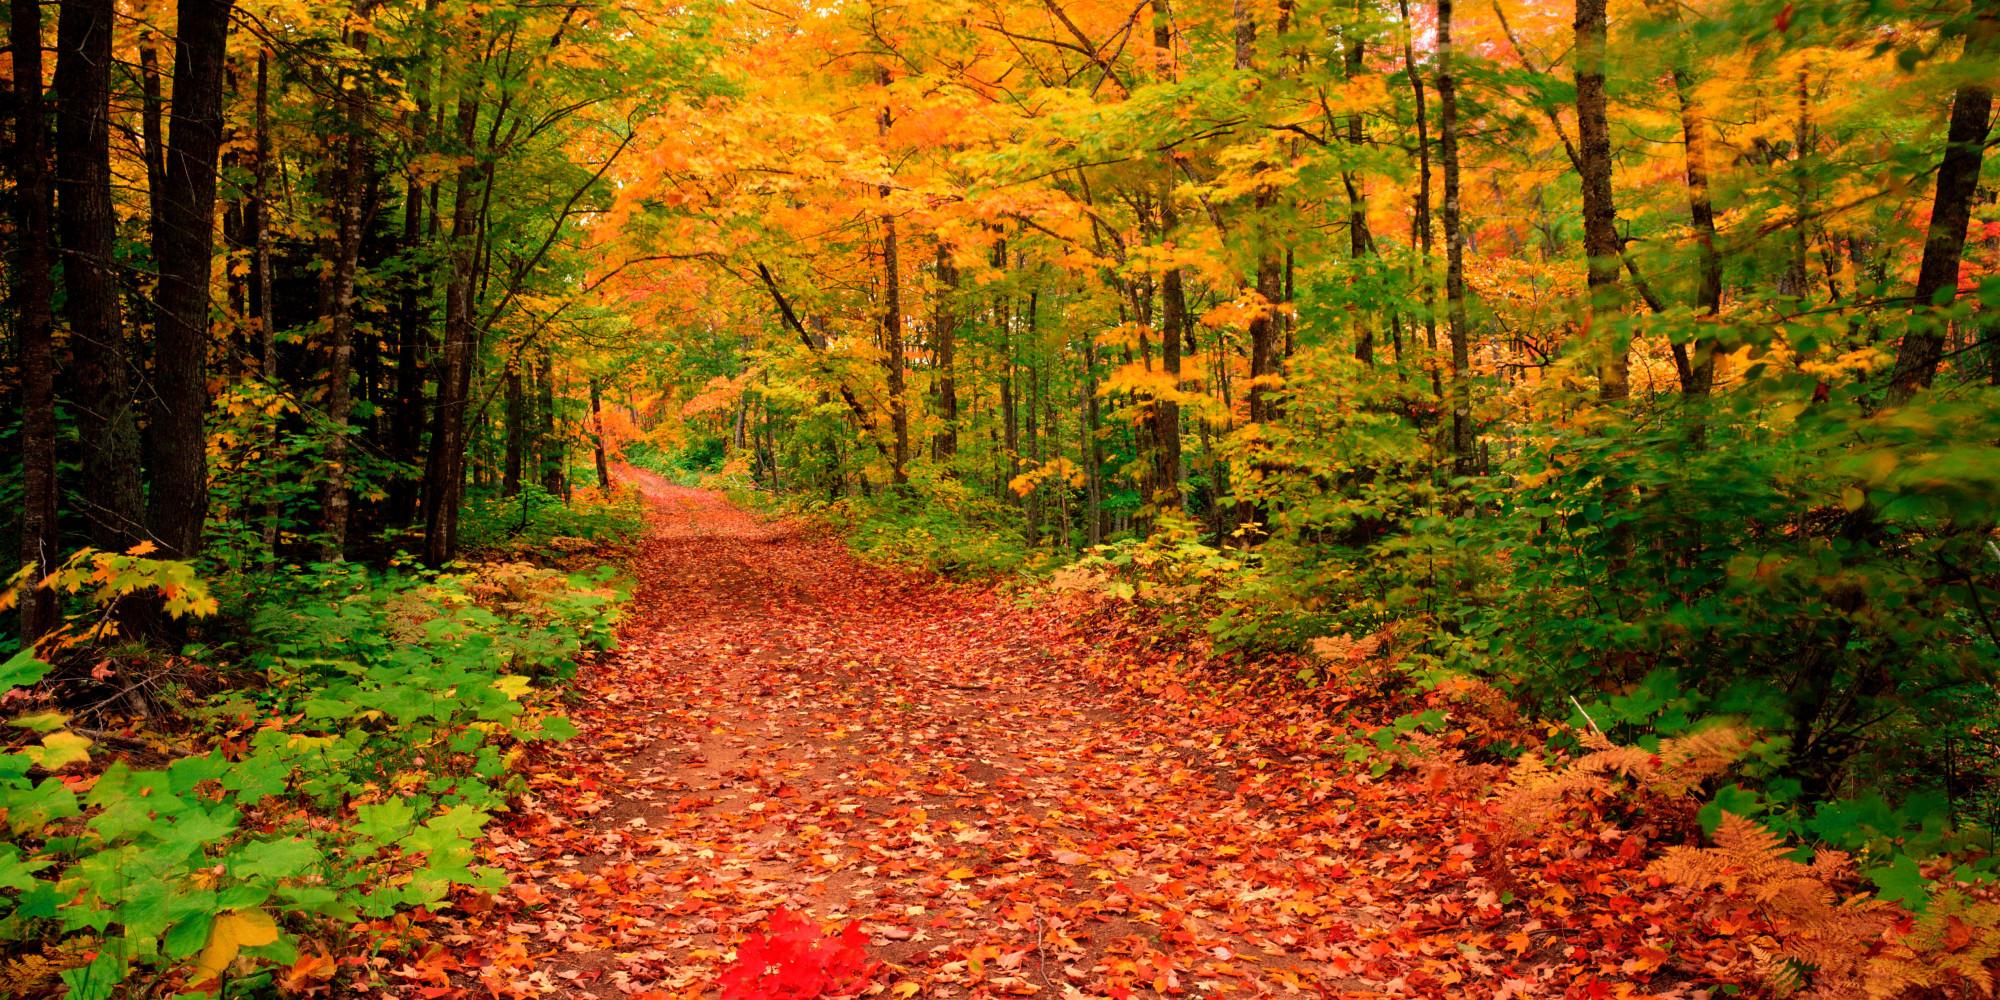 Multonomah Falls Wallpaper Michigan State Parks Offer 70 Fall Festivals